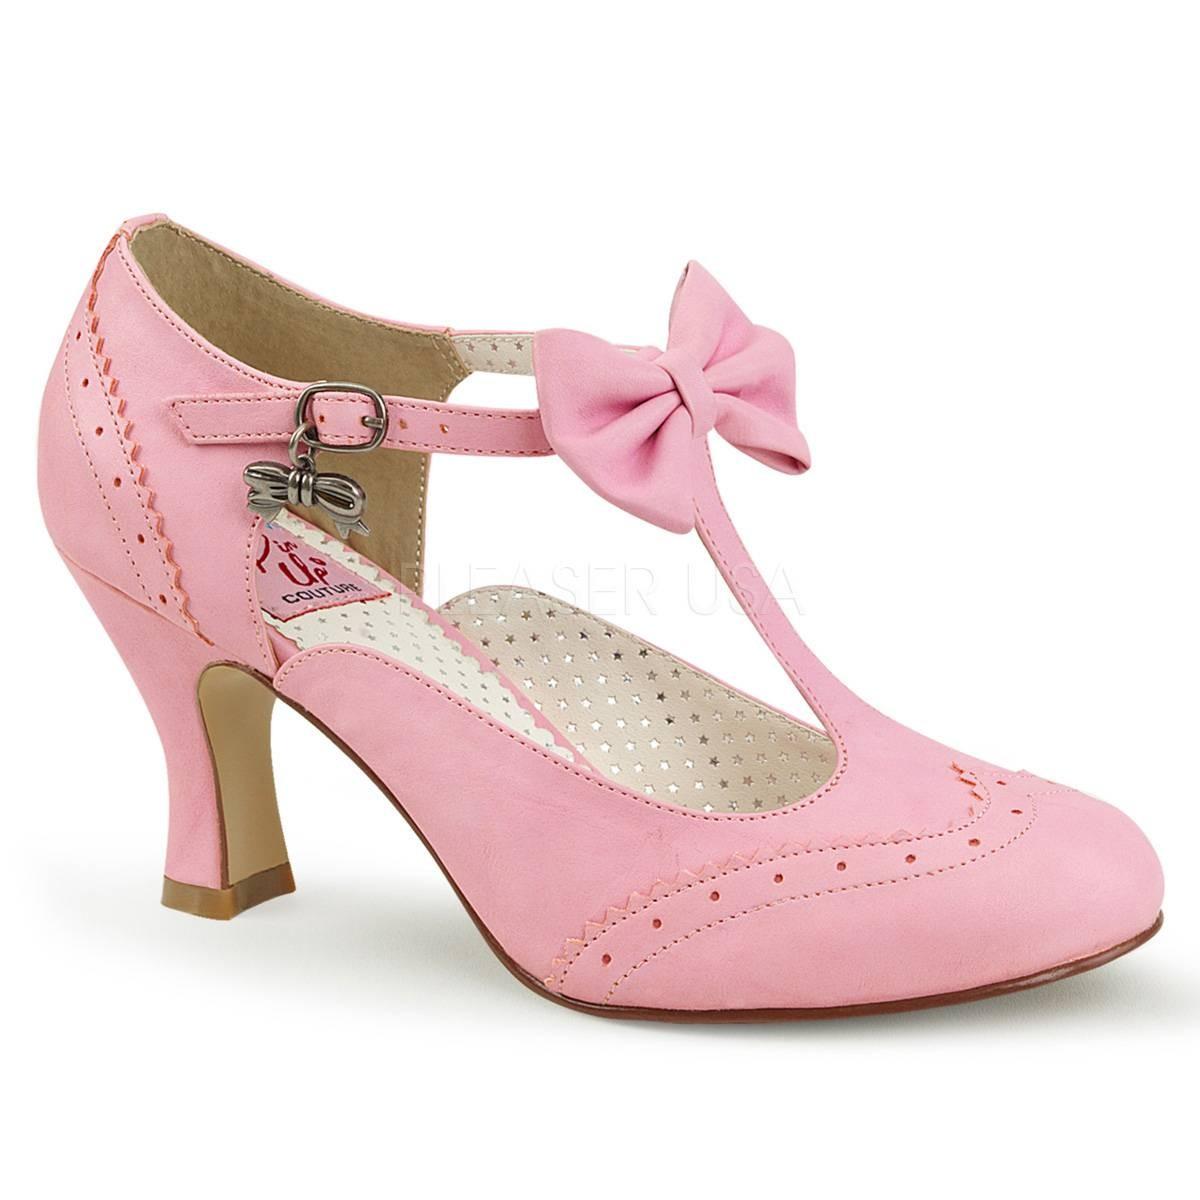 Pumps - FLAPPER 11 ° Damen Pumps ° PinkMatt ° Pin Up Couture  - Onlineshop RedSixty